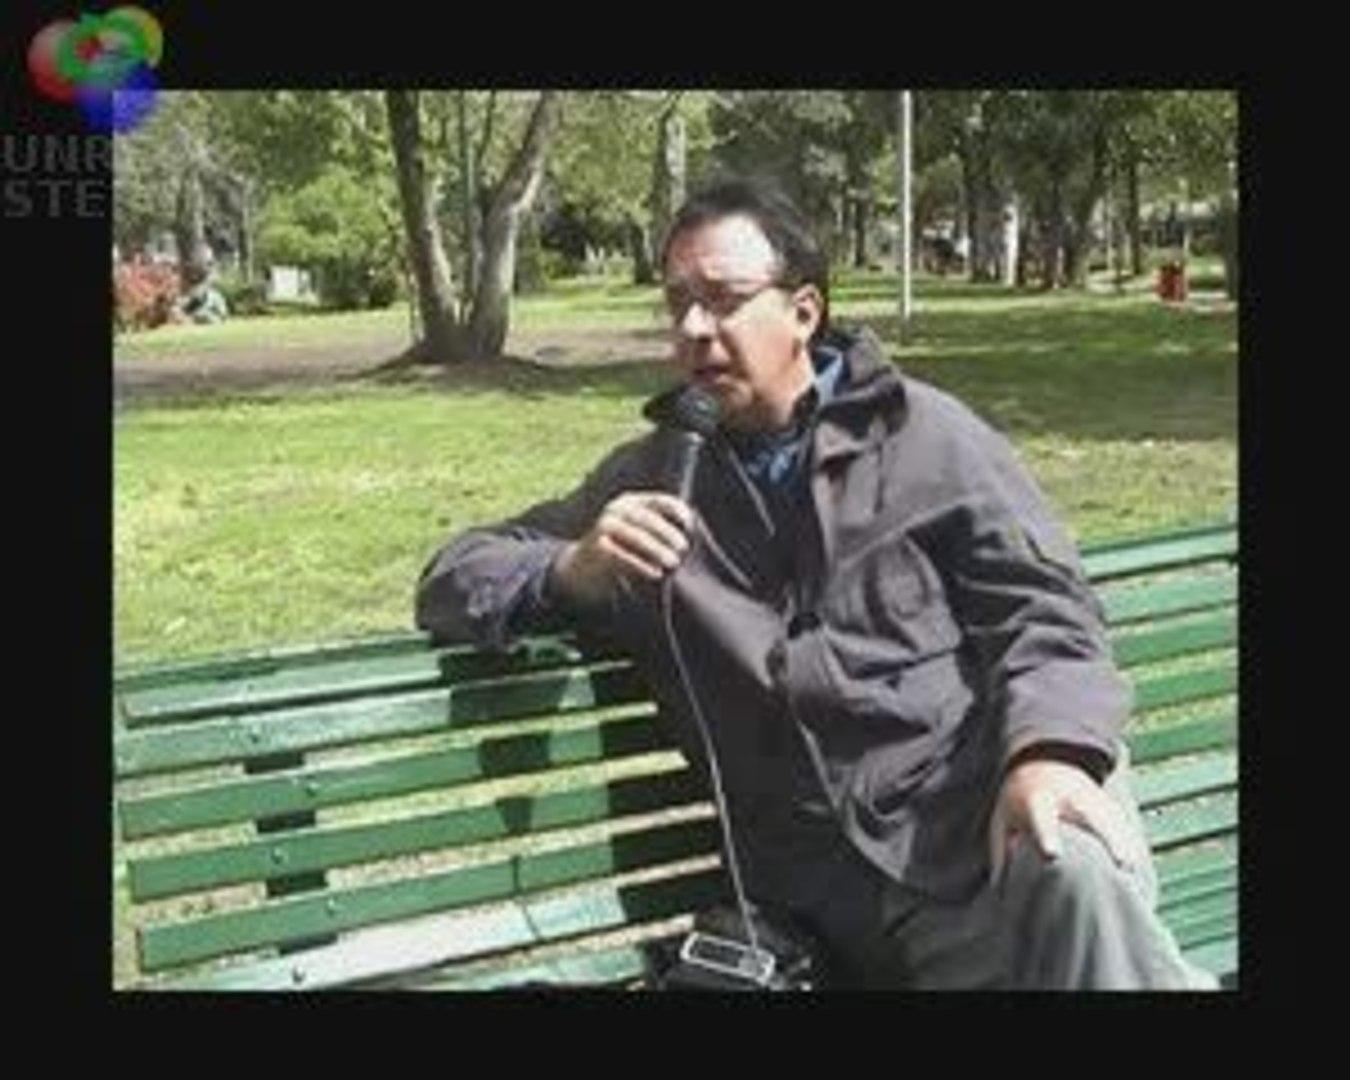 IPODAGUA entrevista al Prof Conti 13-10-2009 - Parte 2 de 2